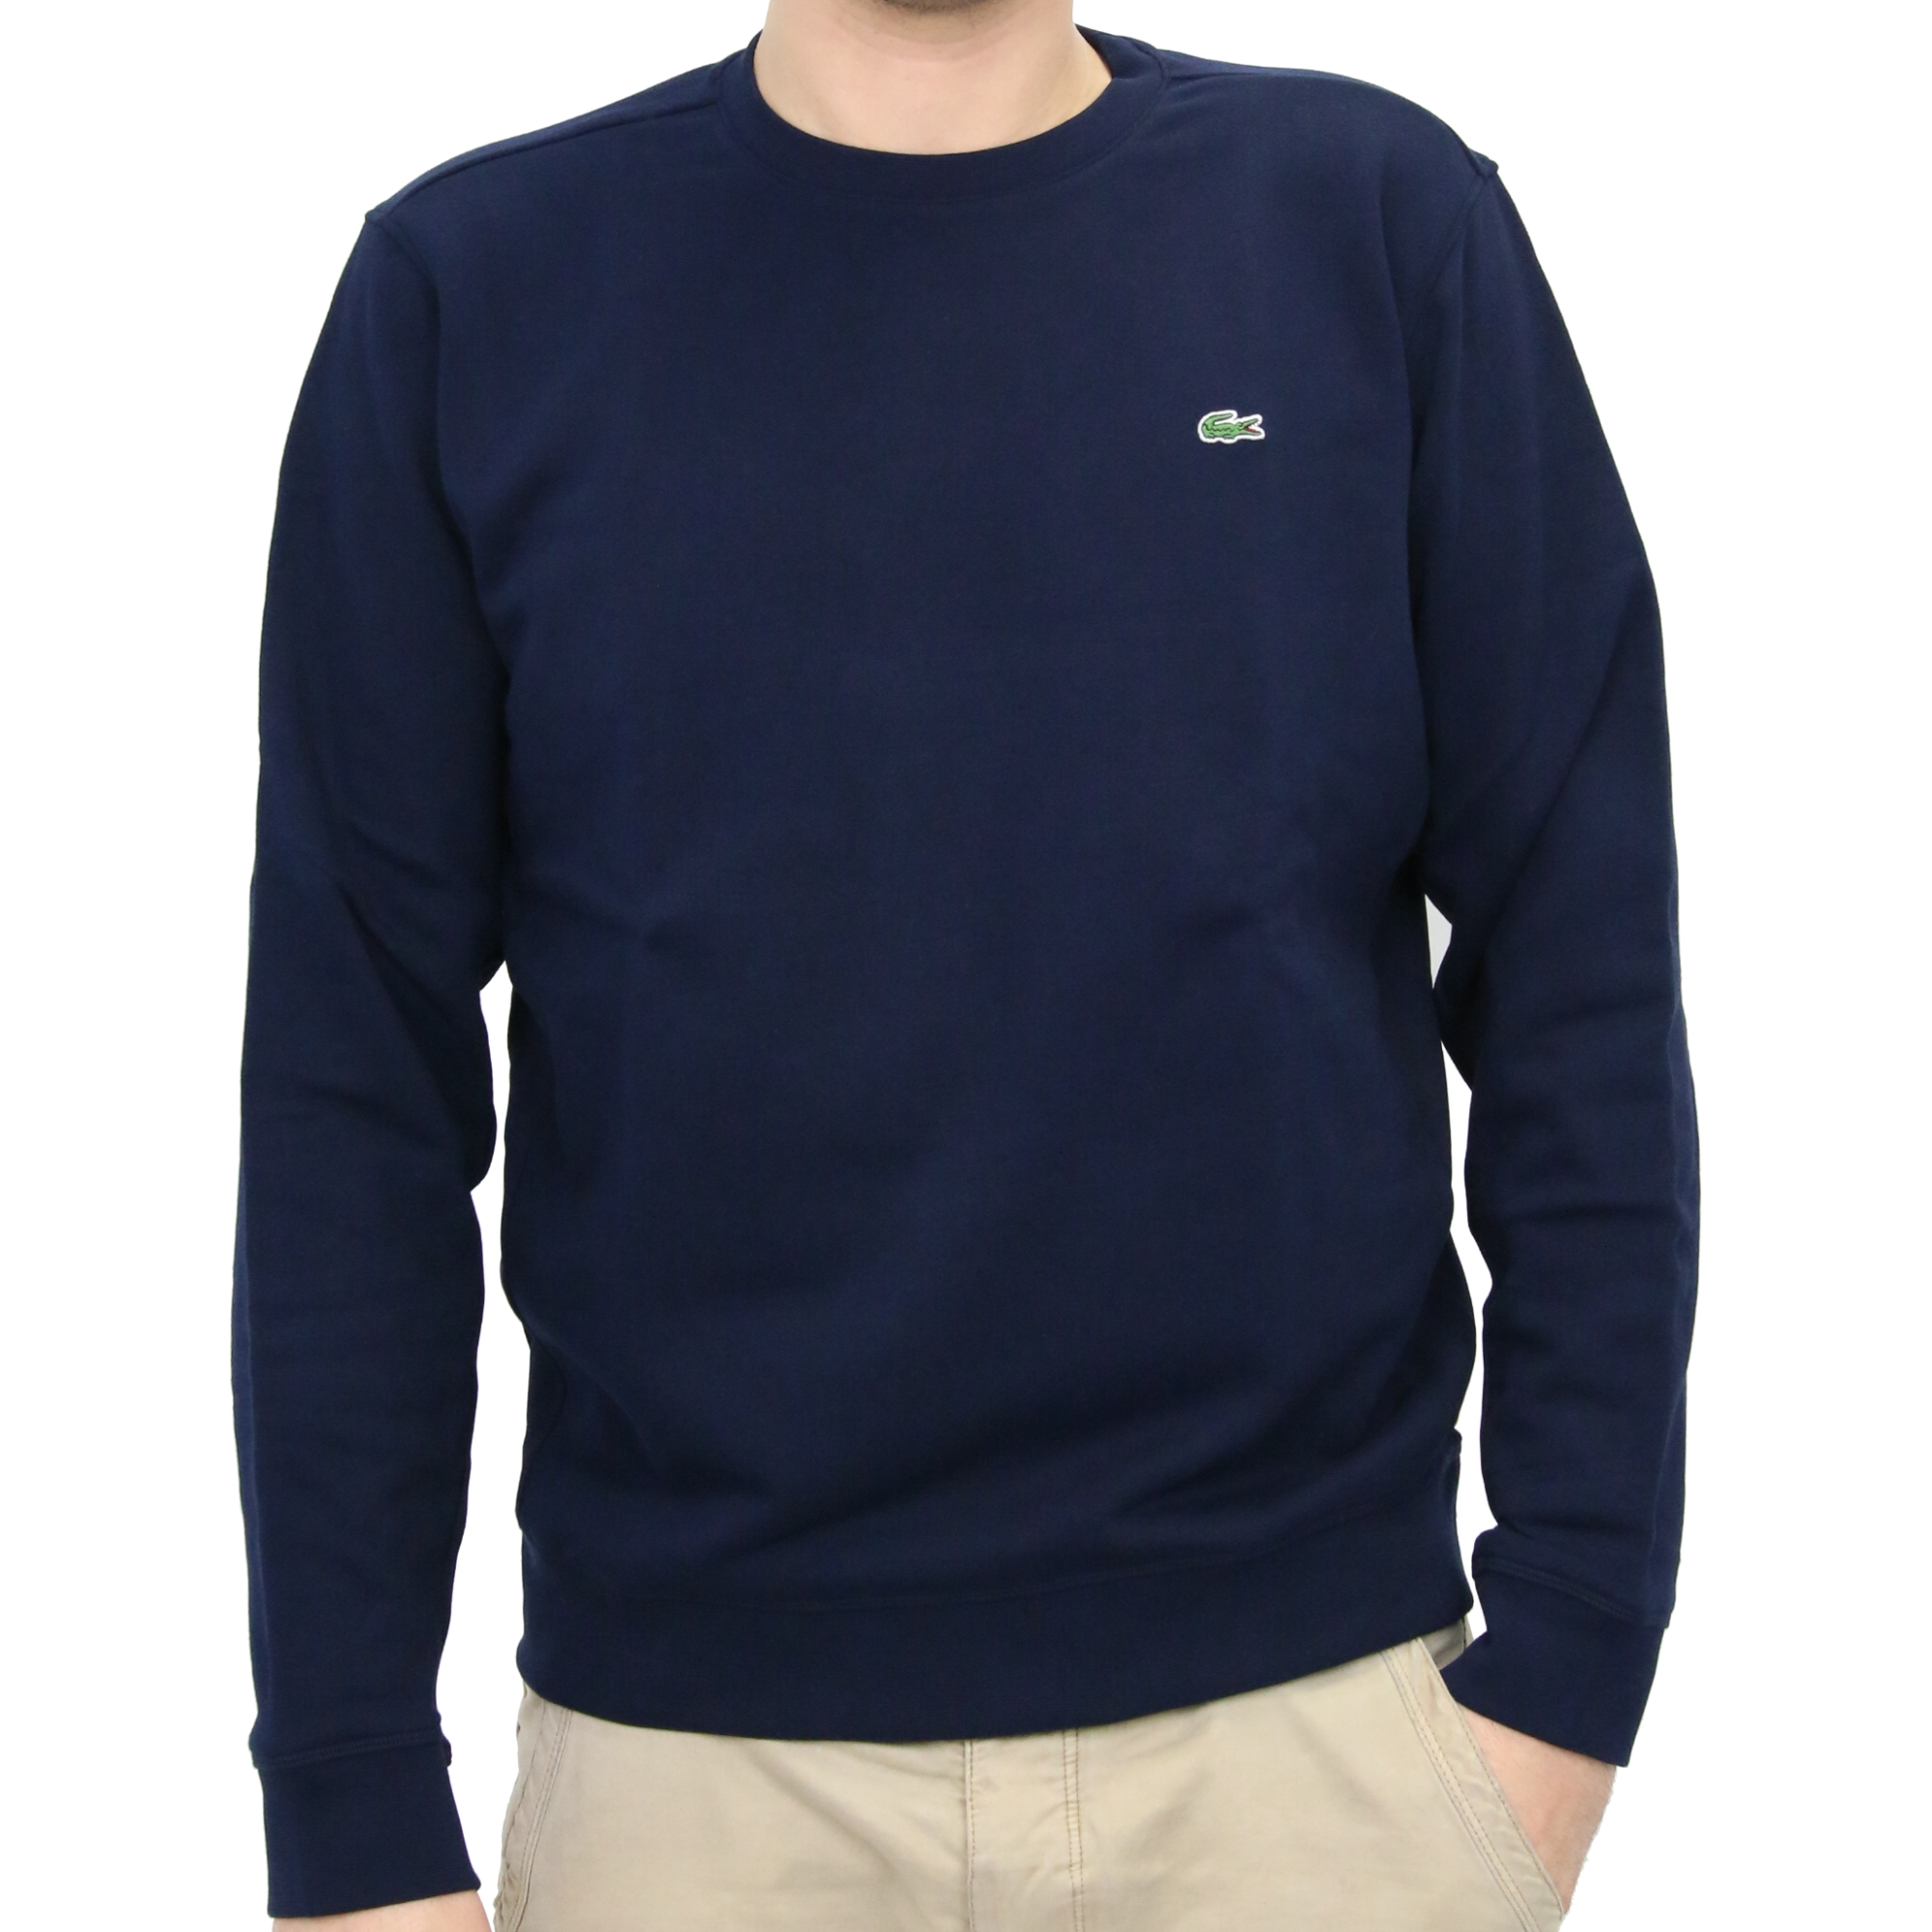 lacoste pullover sweatshirt rundhals baumwolle herren ah7417 ebay. Black Bedroom Furniture Sets. Home Design Ideas